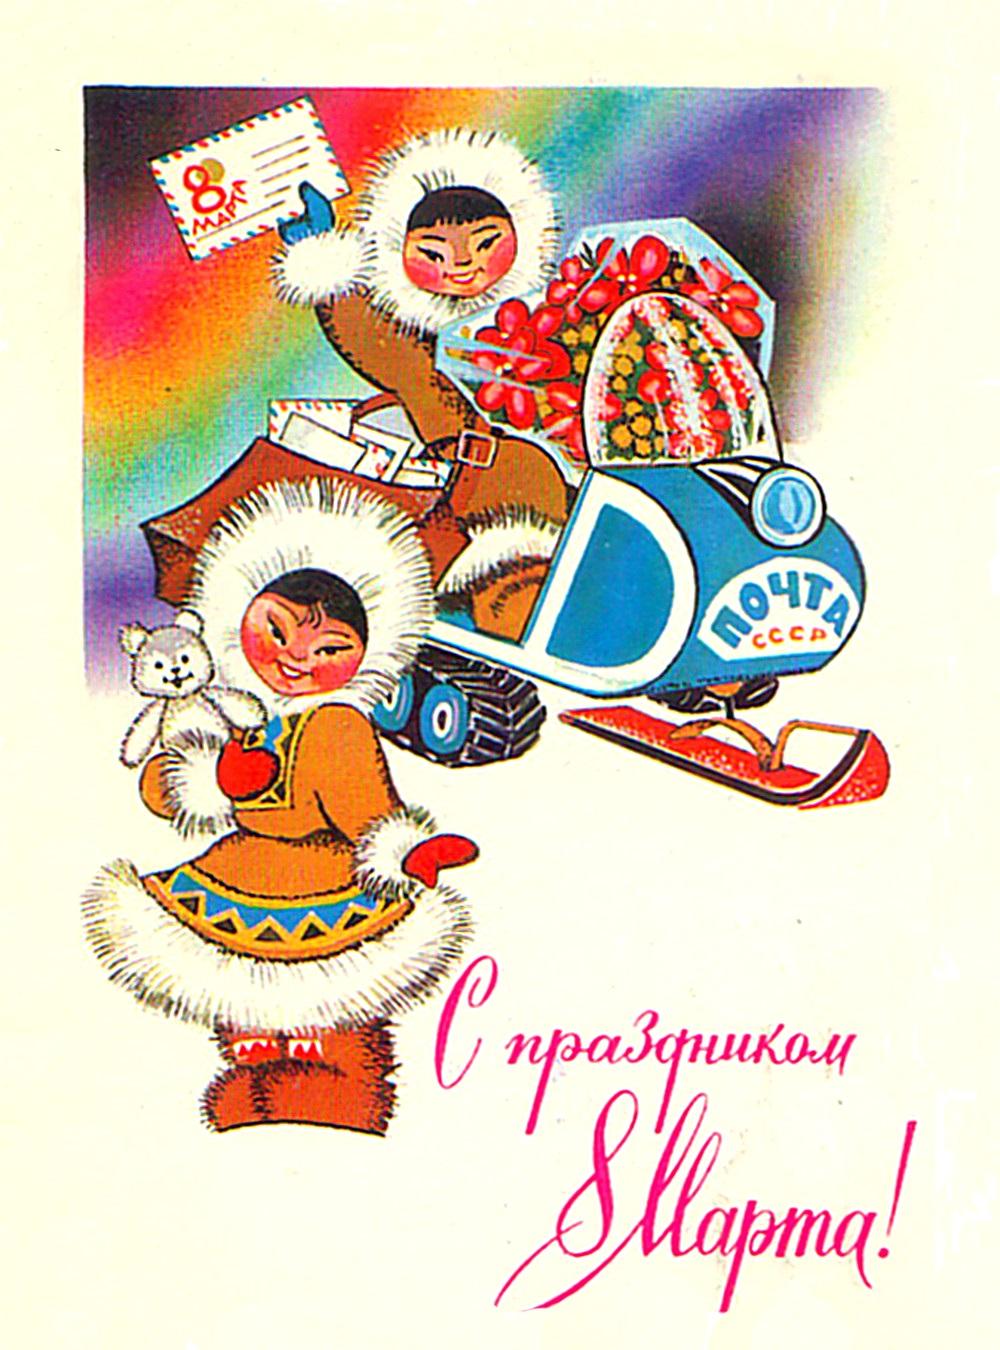 00 International Women's Day card 02. 1970s. 08.03.14